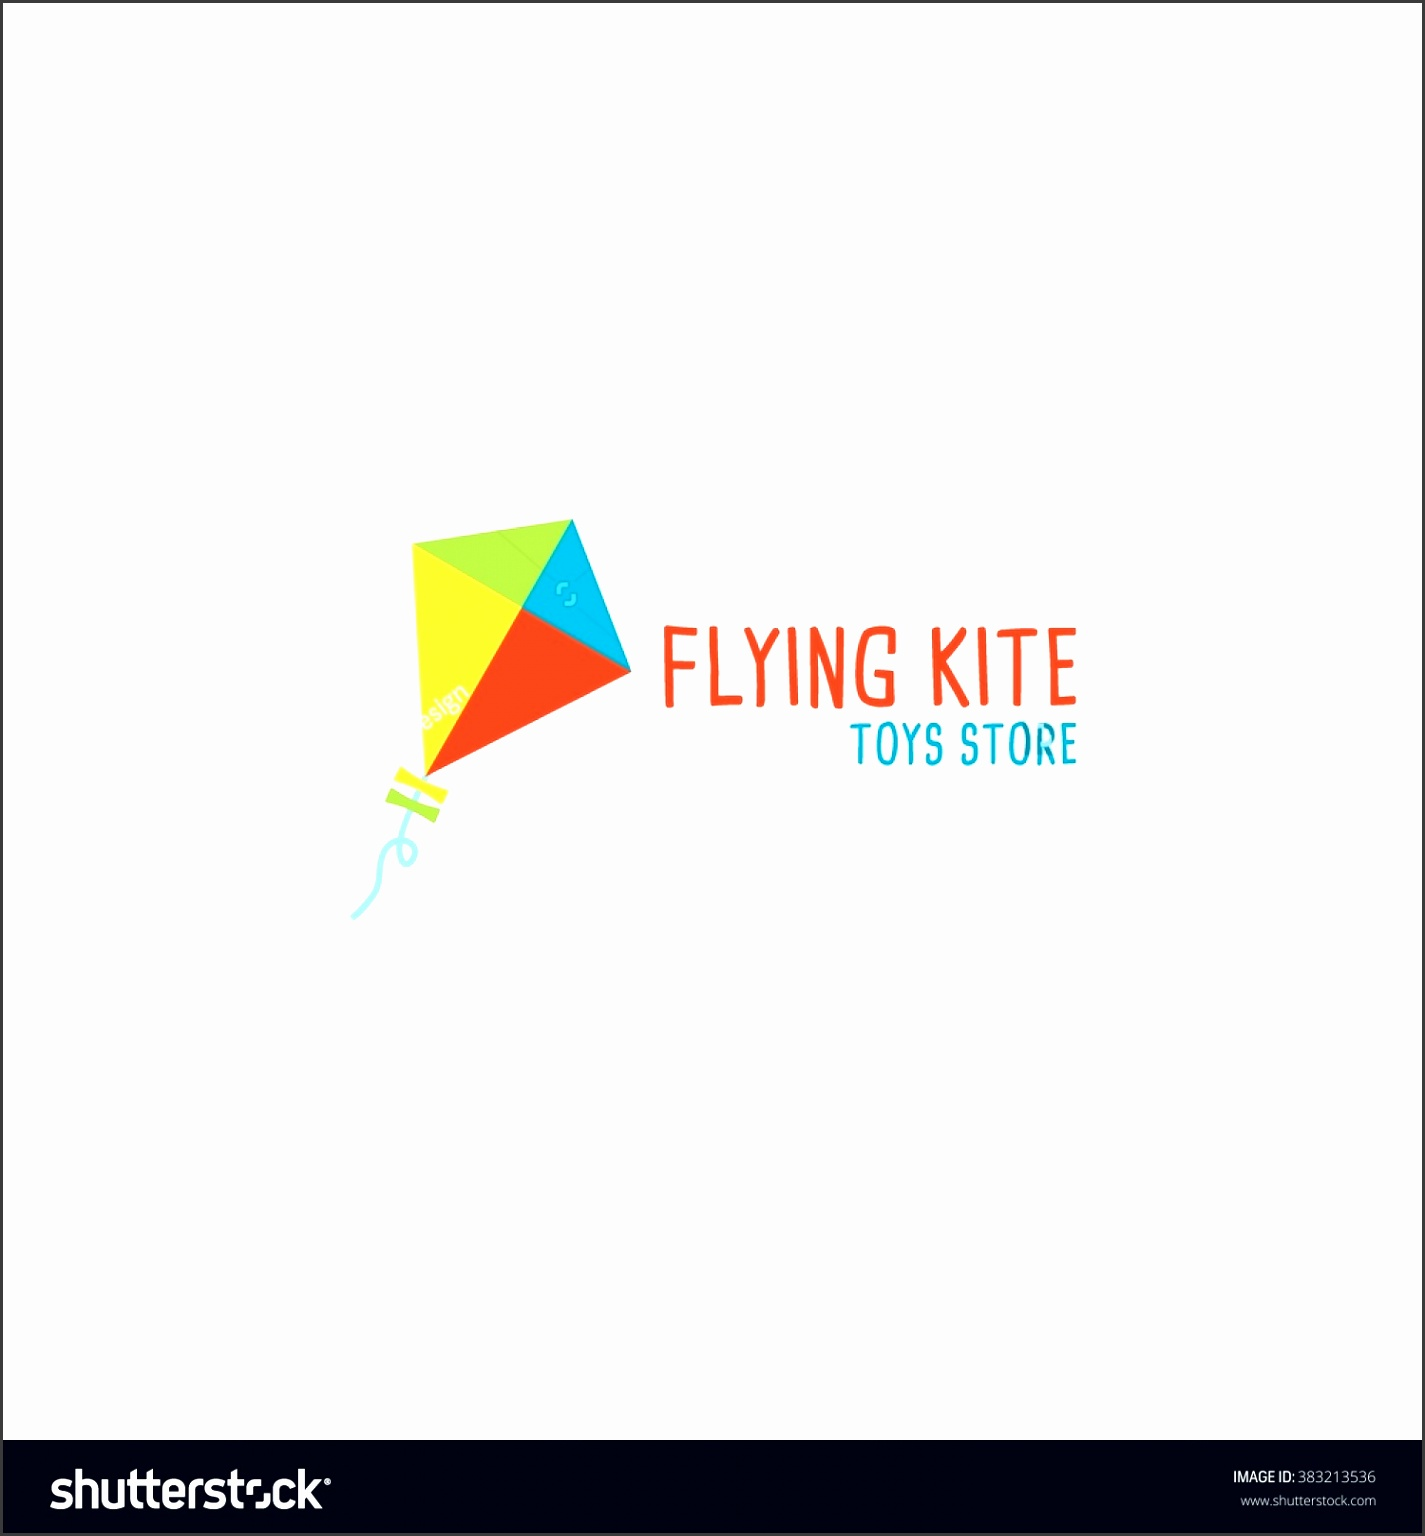 lovely kite toy shop logo design template vector illustration